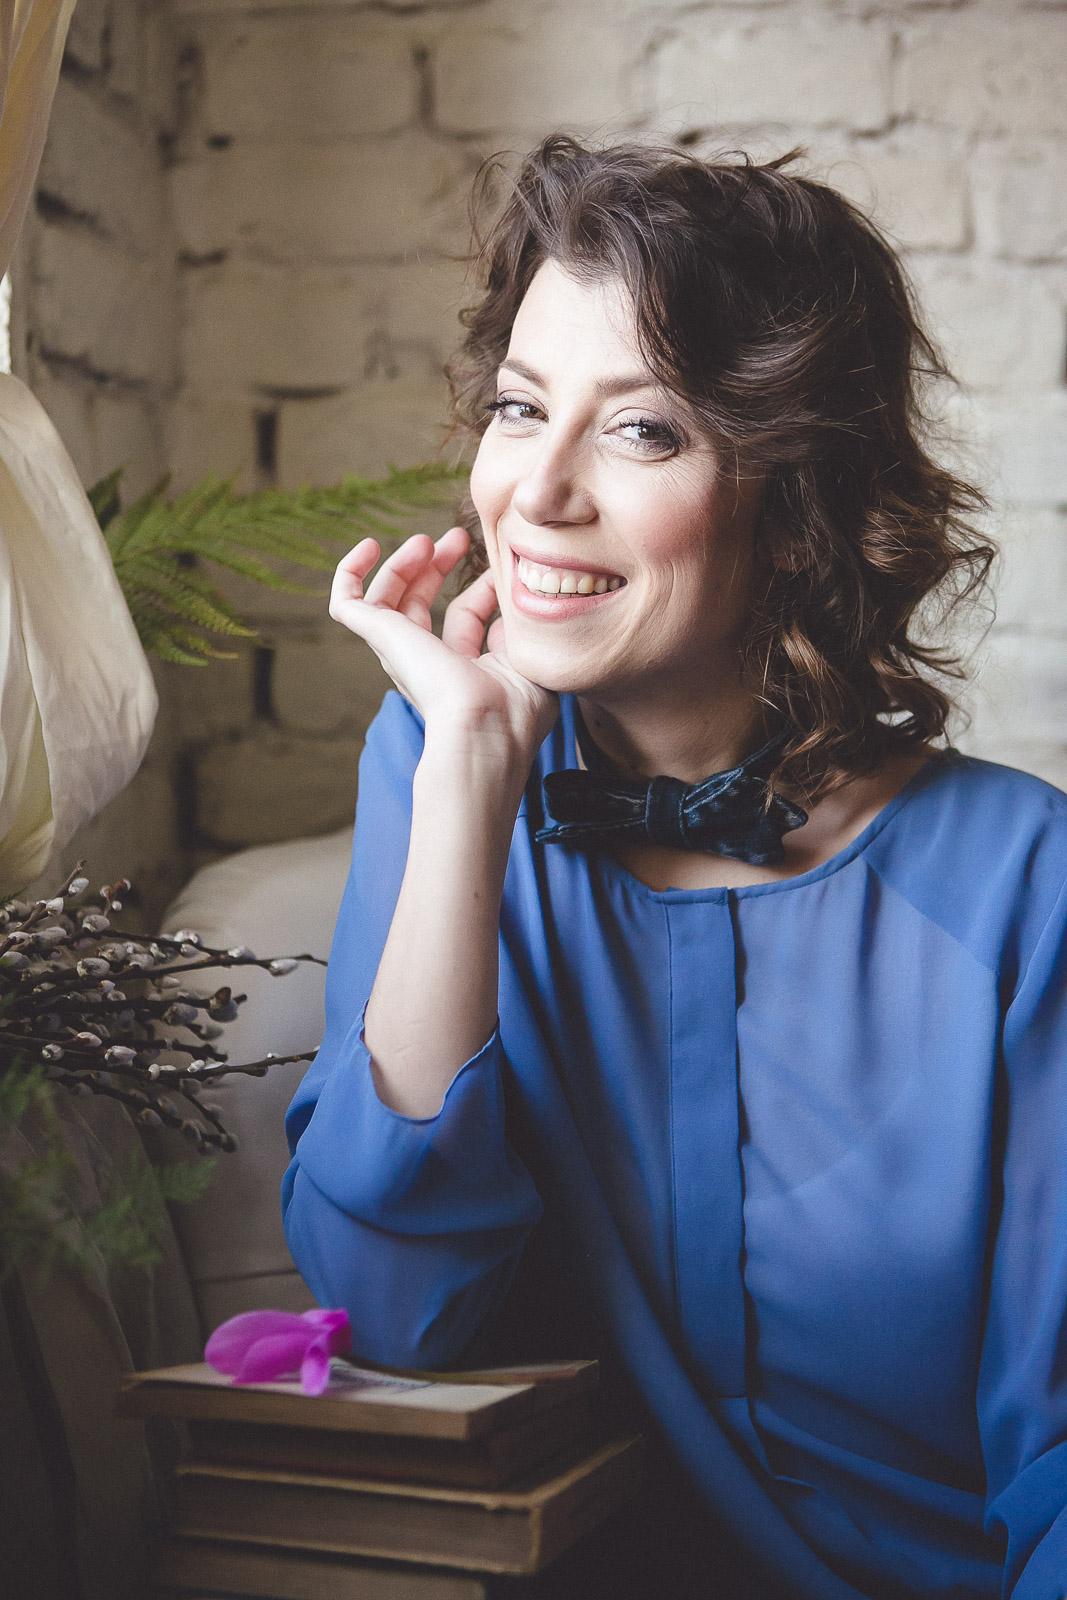 Dragana_Portraits-13.jpg